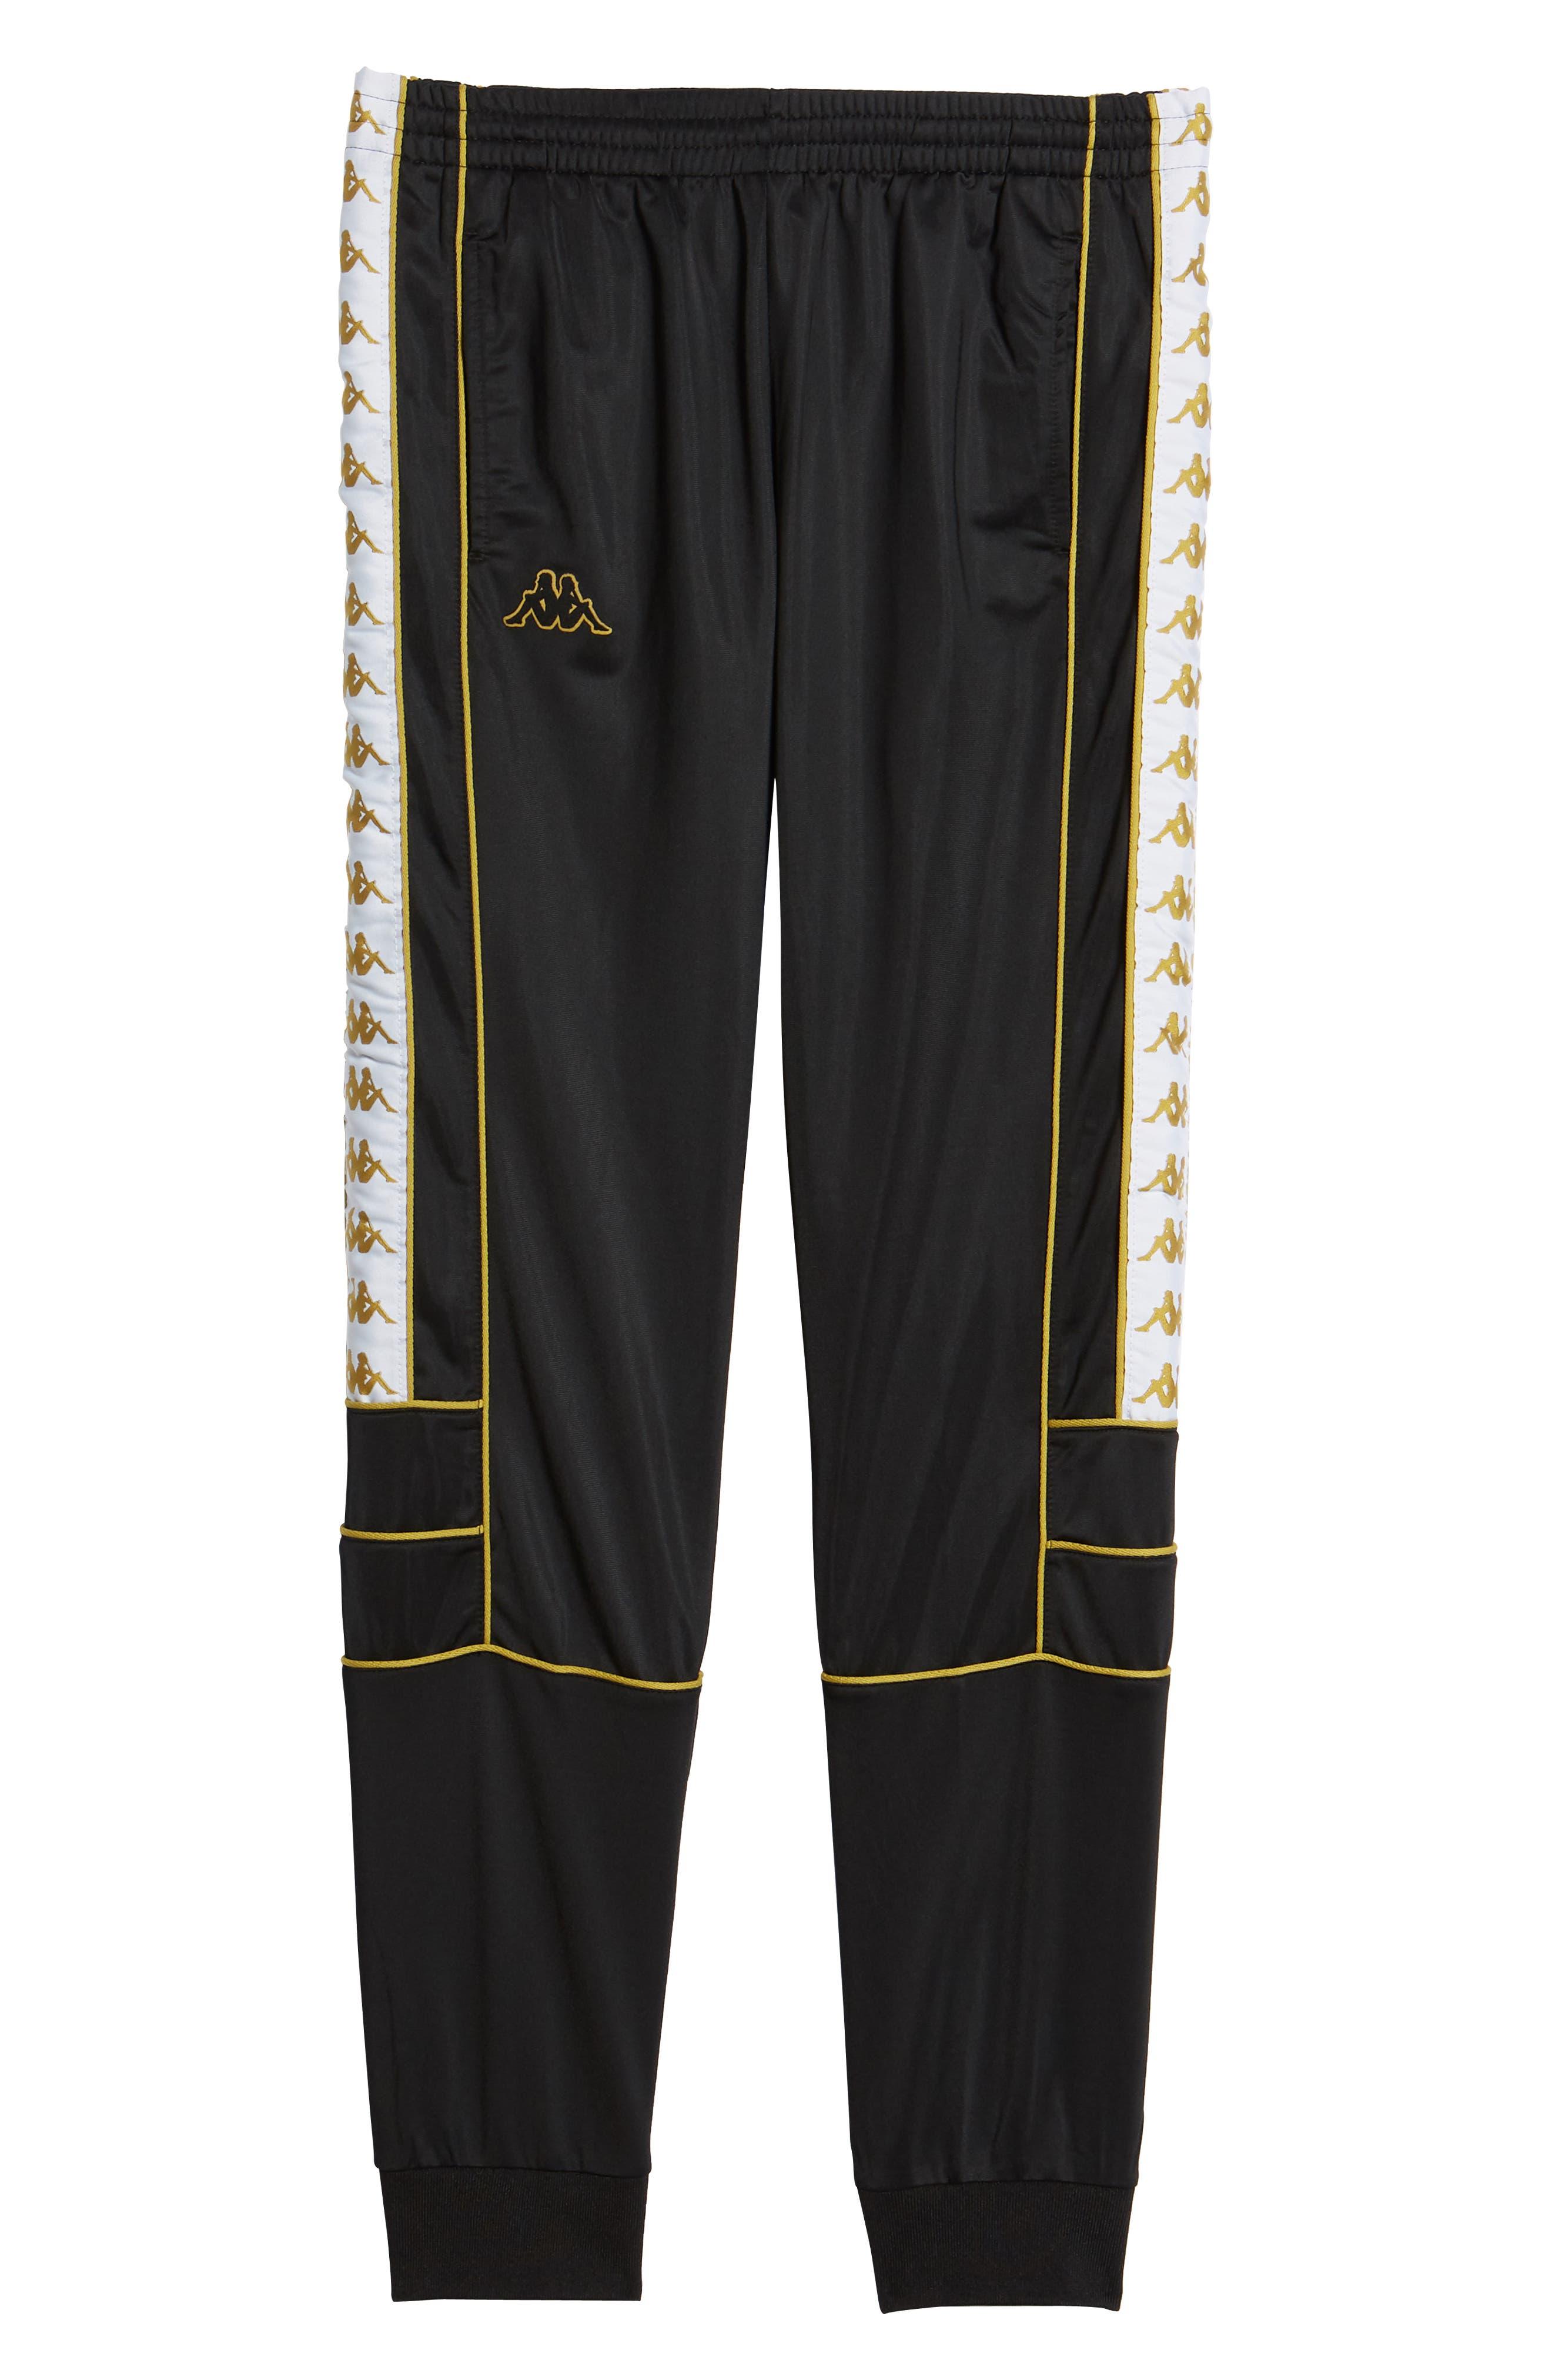 Racing Track Pants,                             Alternate thumbnail 6, color,                             Black/ White Gold